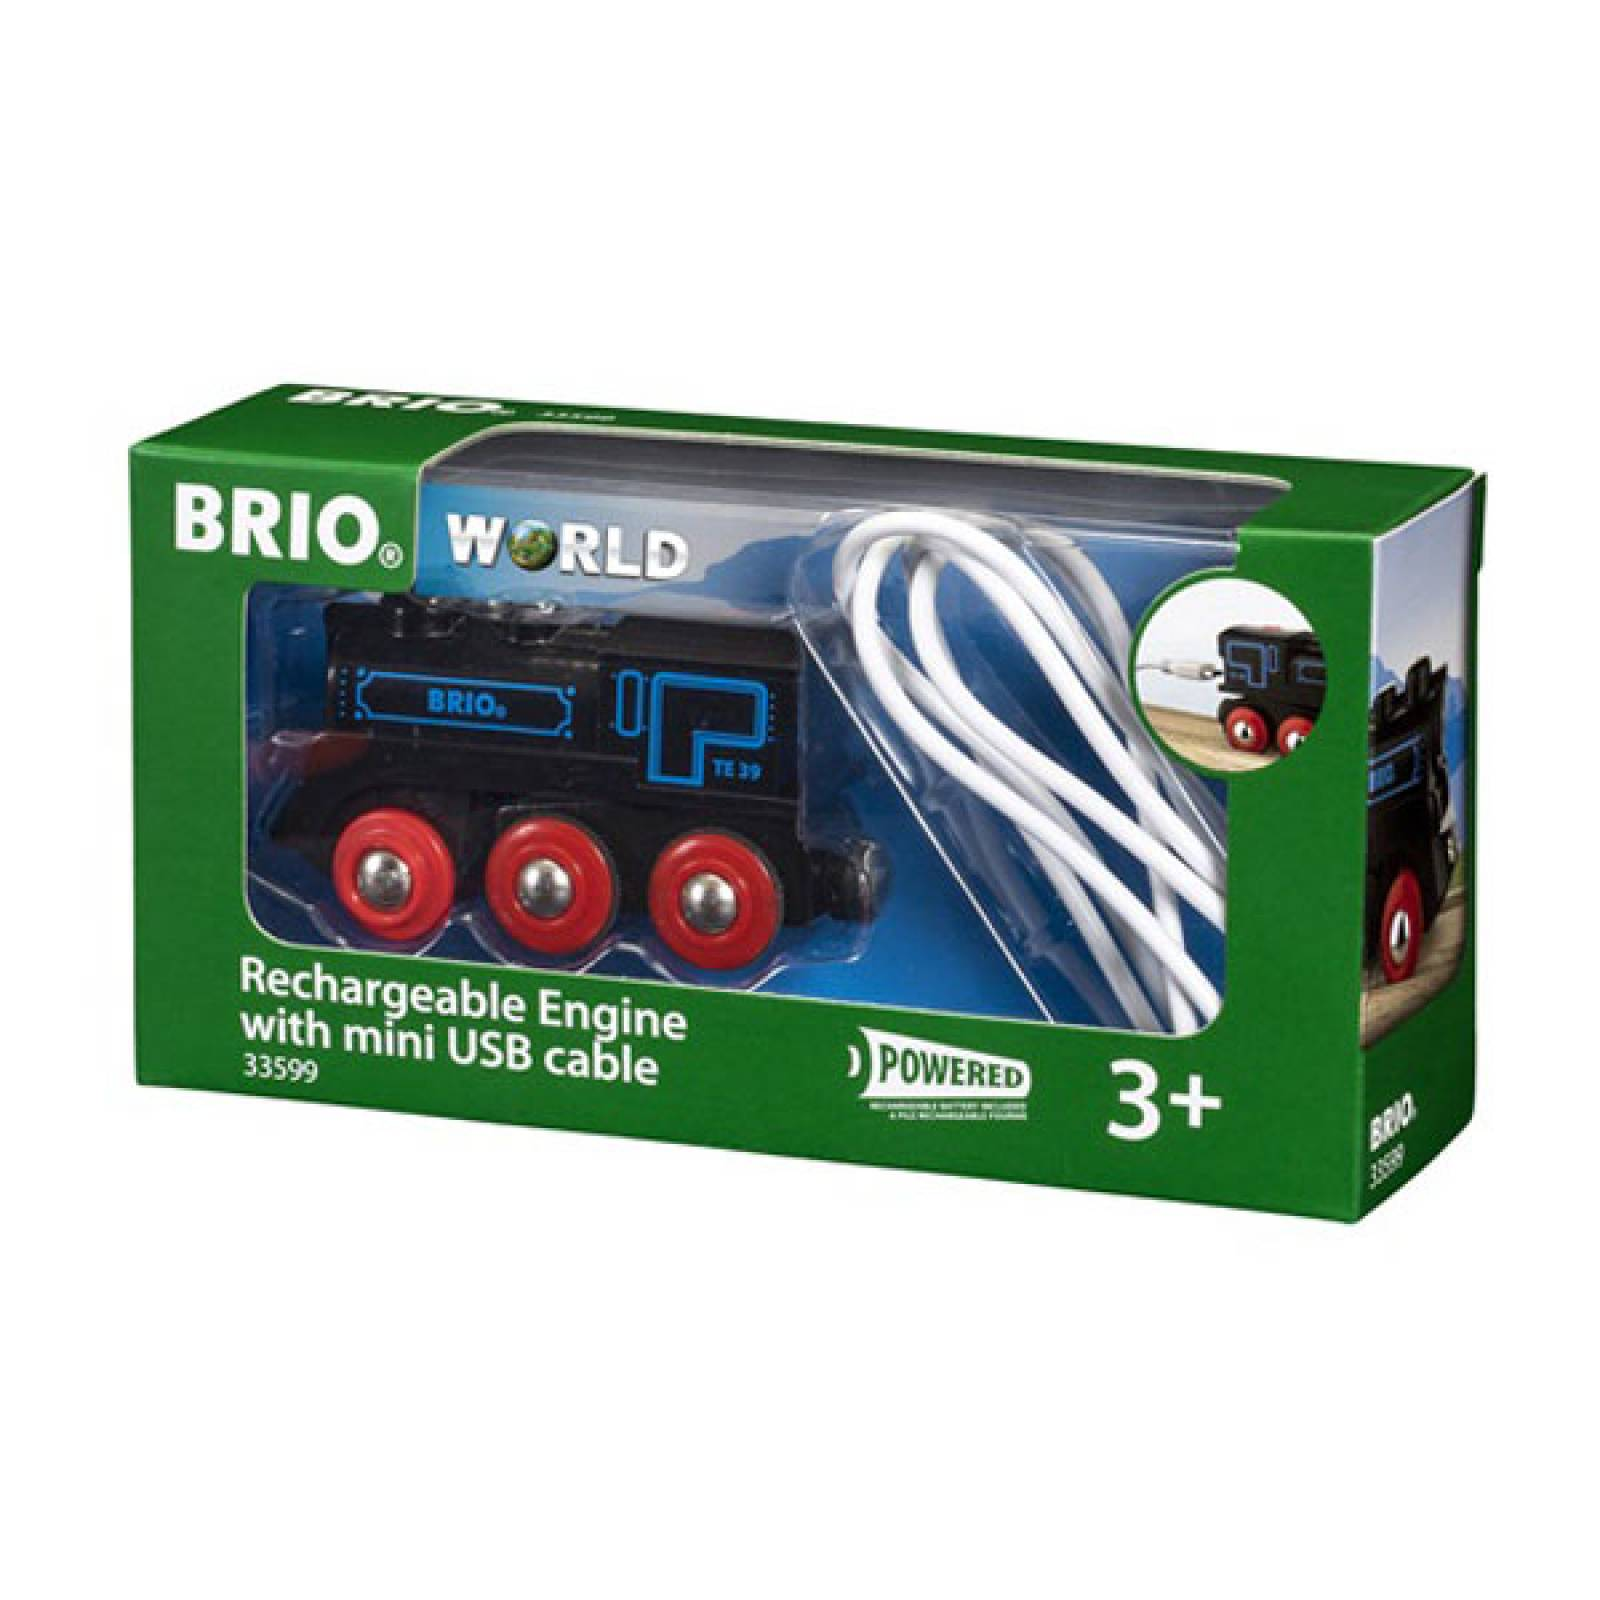 Rechargeable Engine Mini USB BRIO Wooden Railway Age 3+ thumbnails